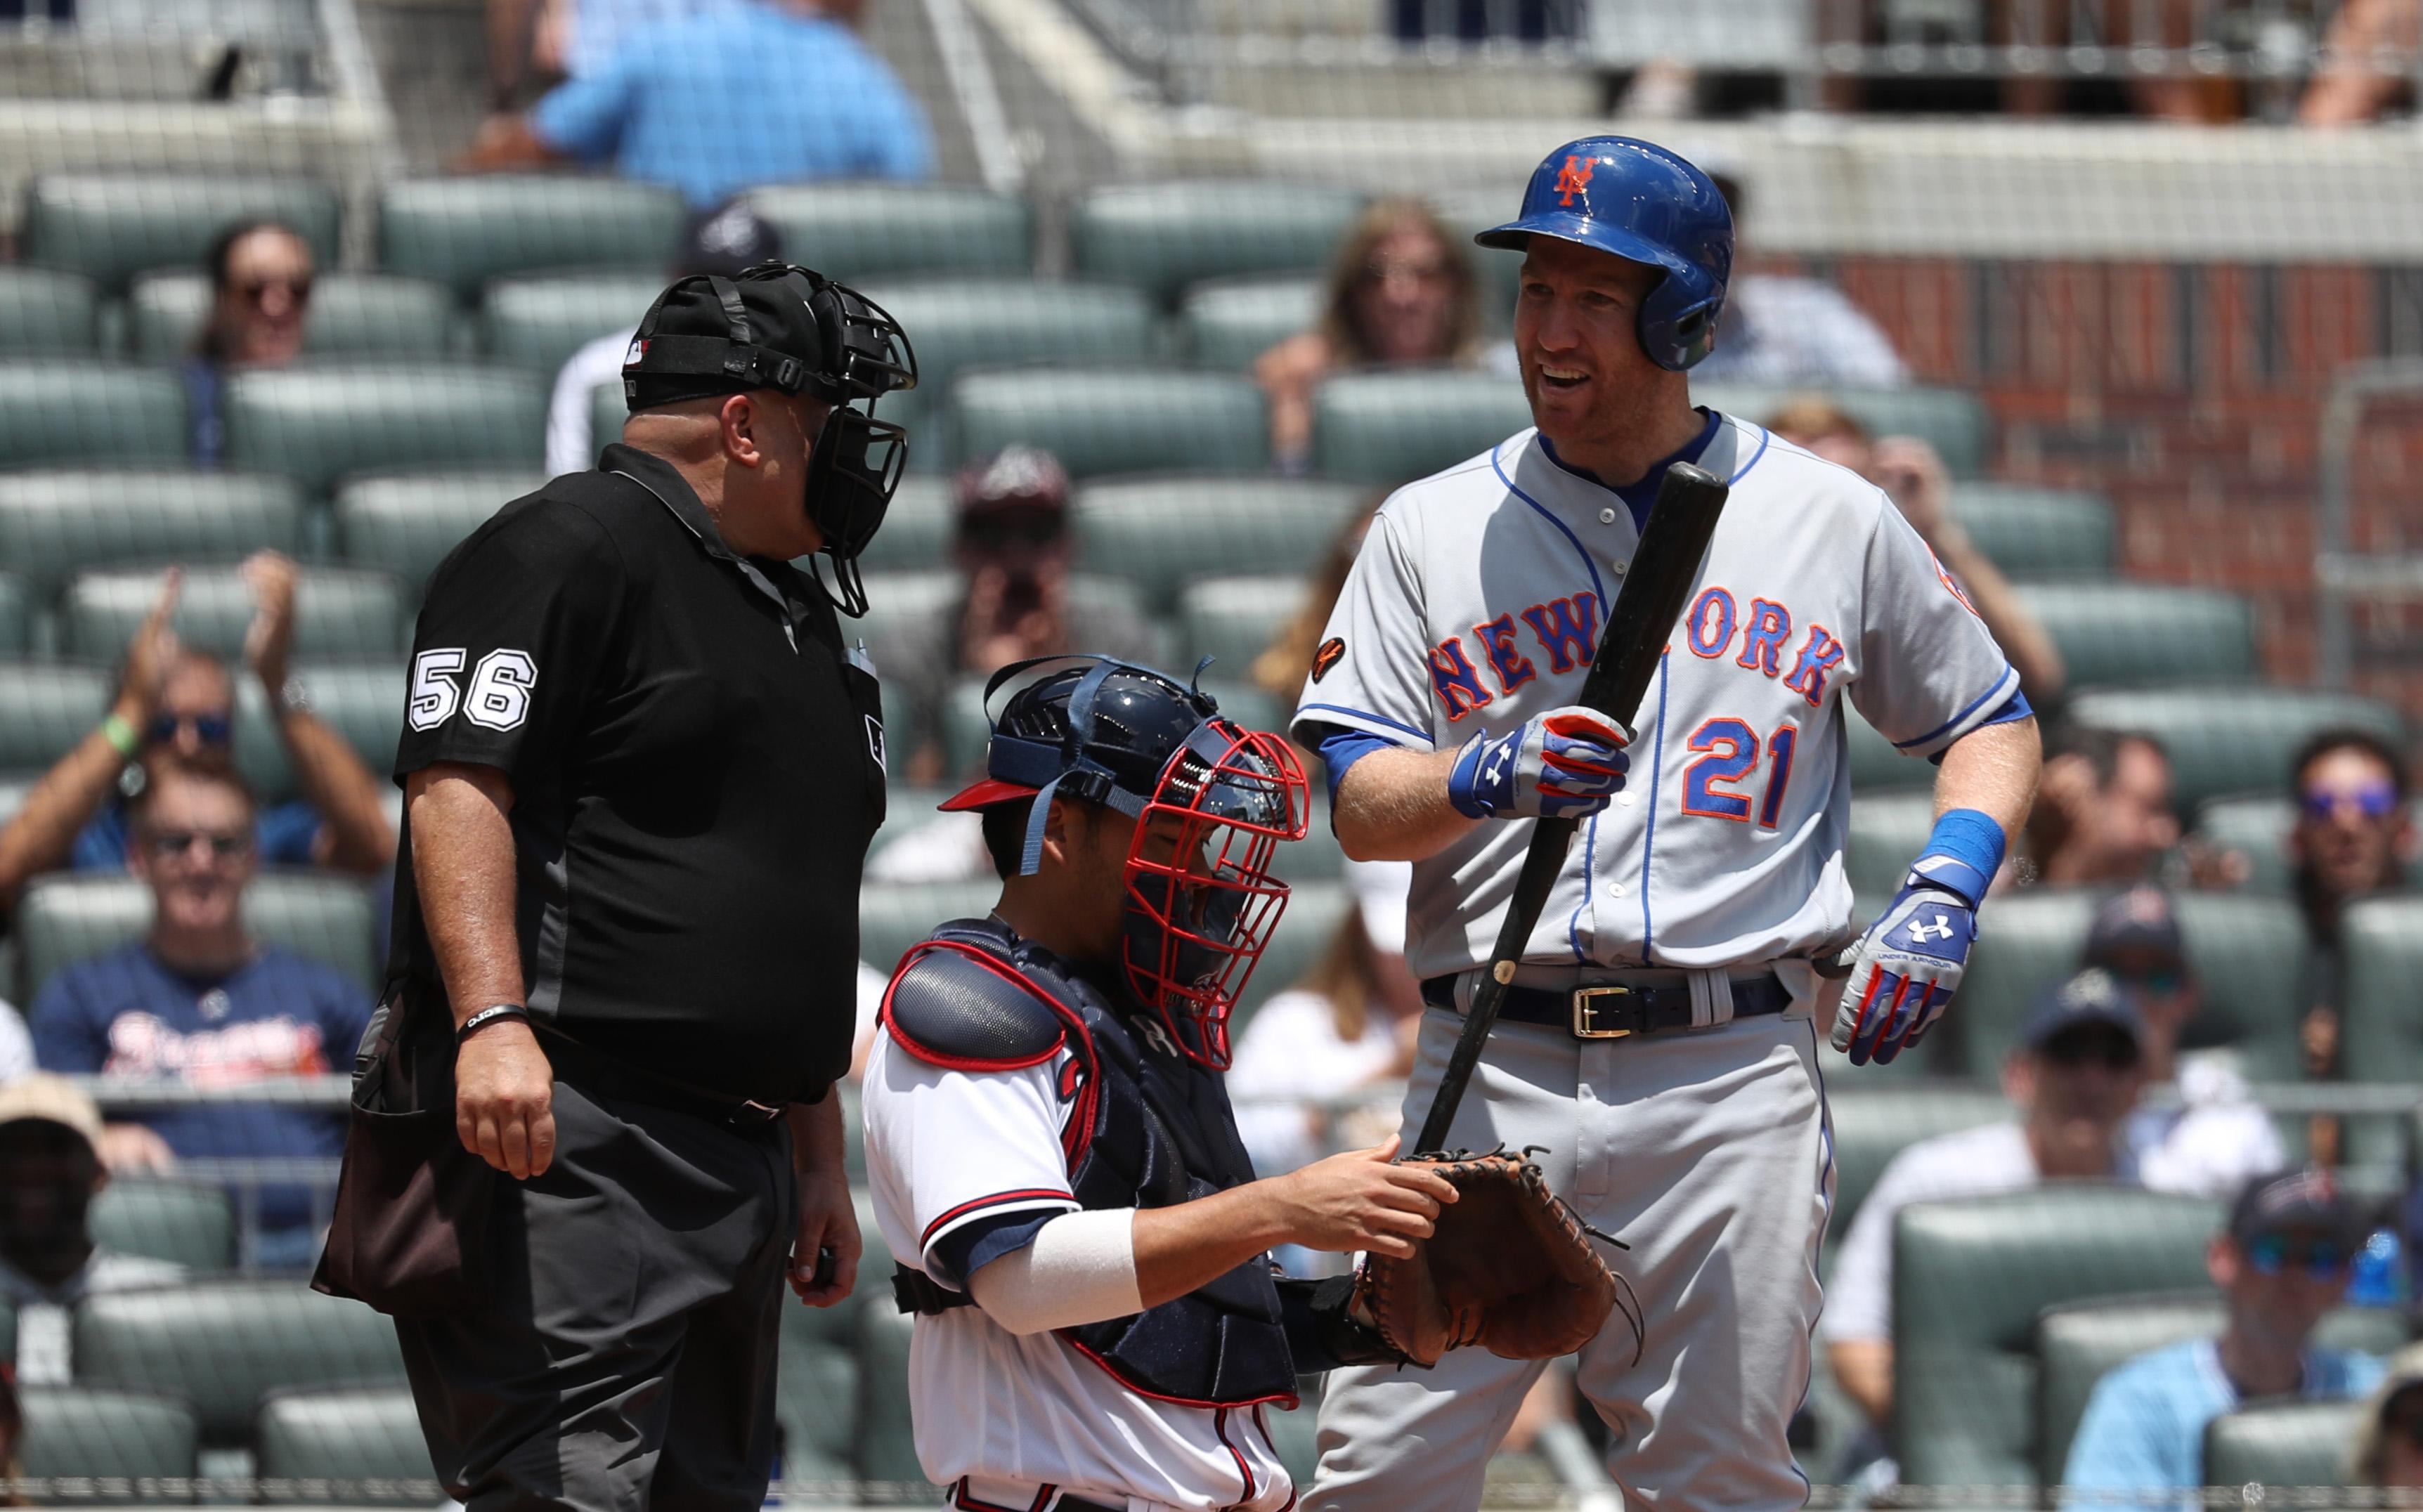 6/14/18 Game Preview: New York Mets At Arizona Diamondbacks